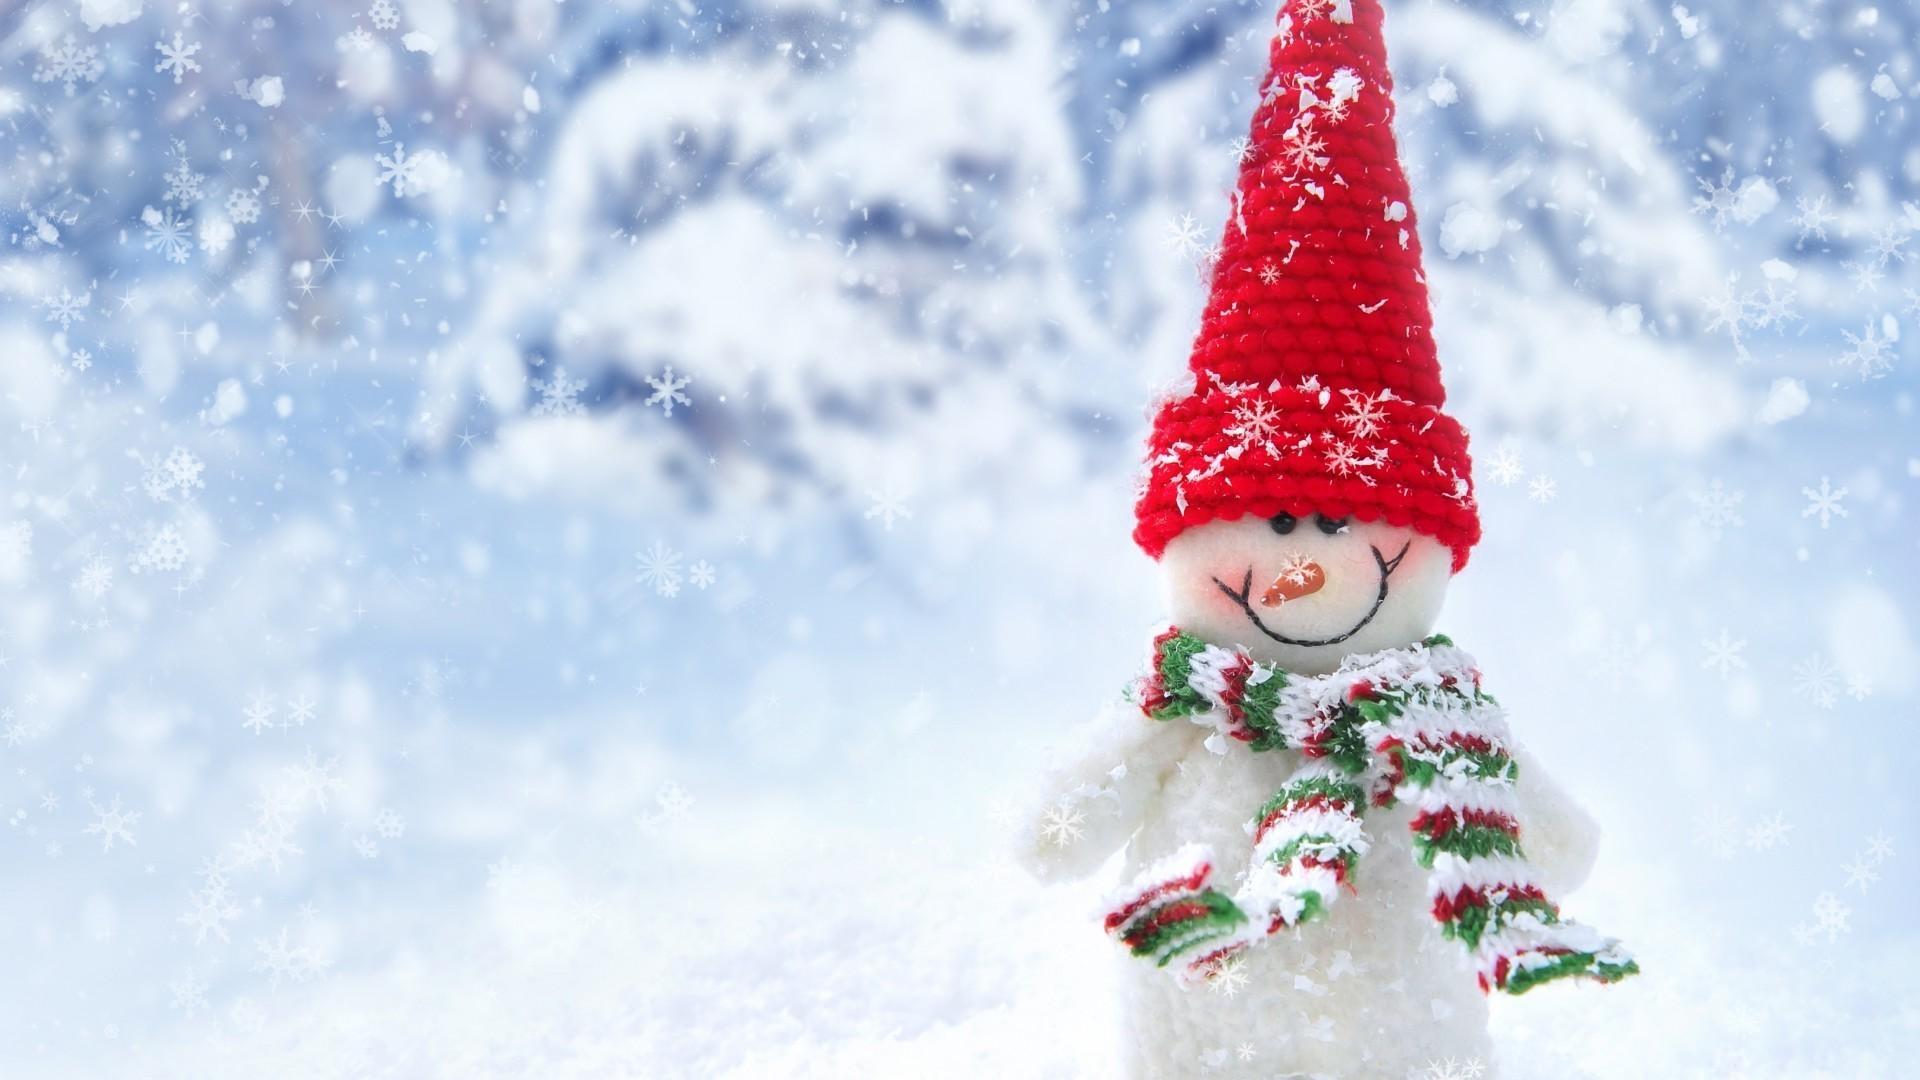 Обои На Телефон Зима Снеговики